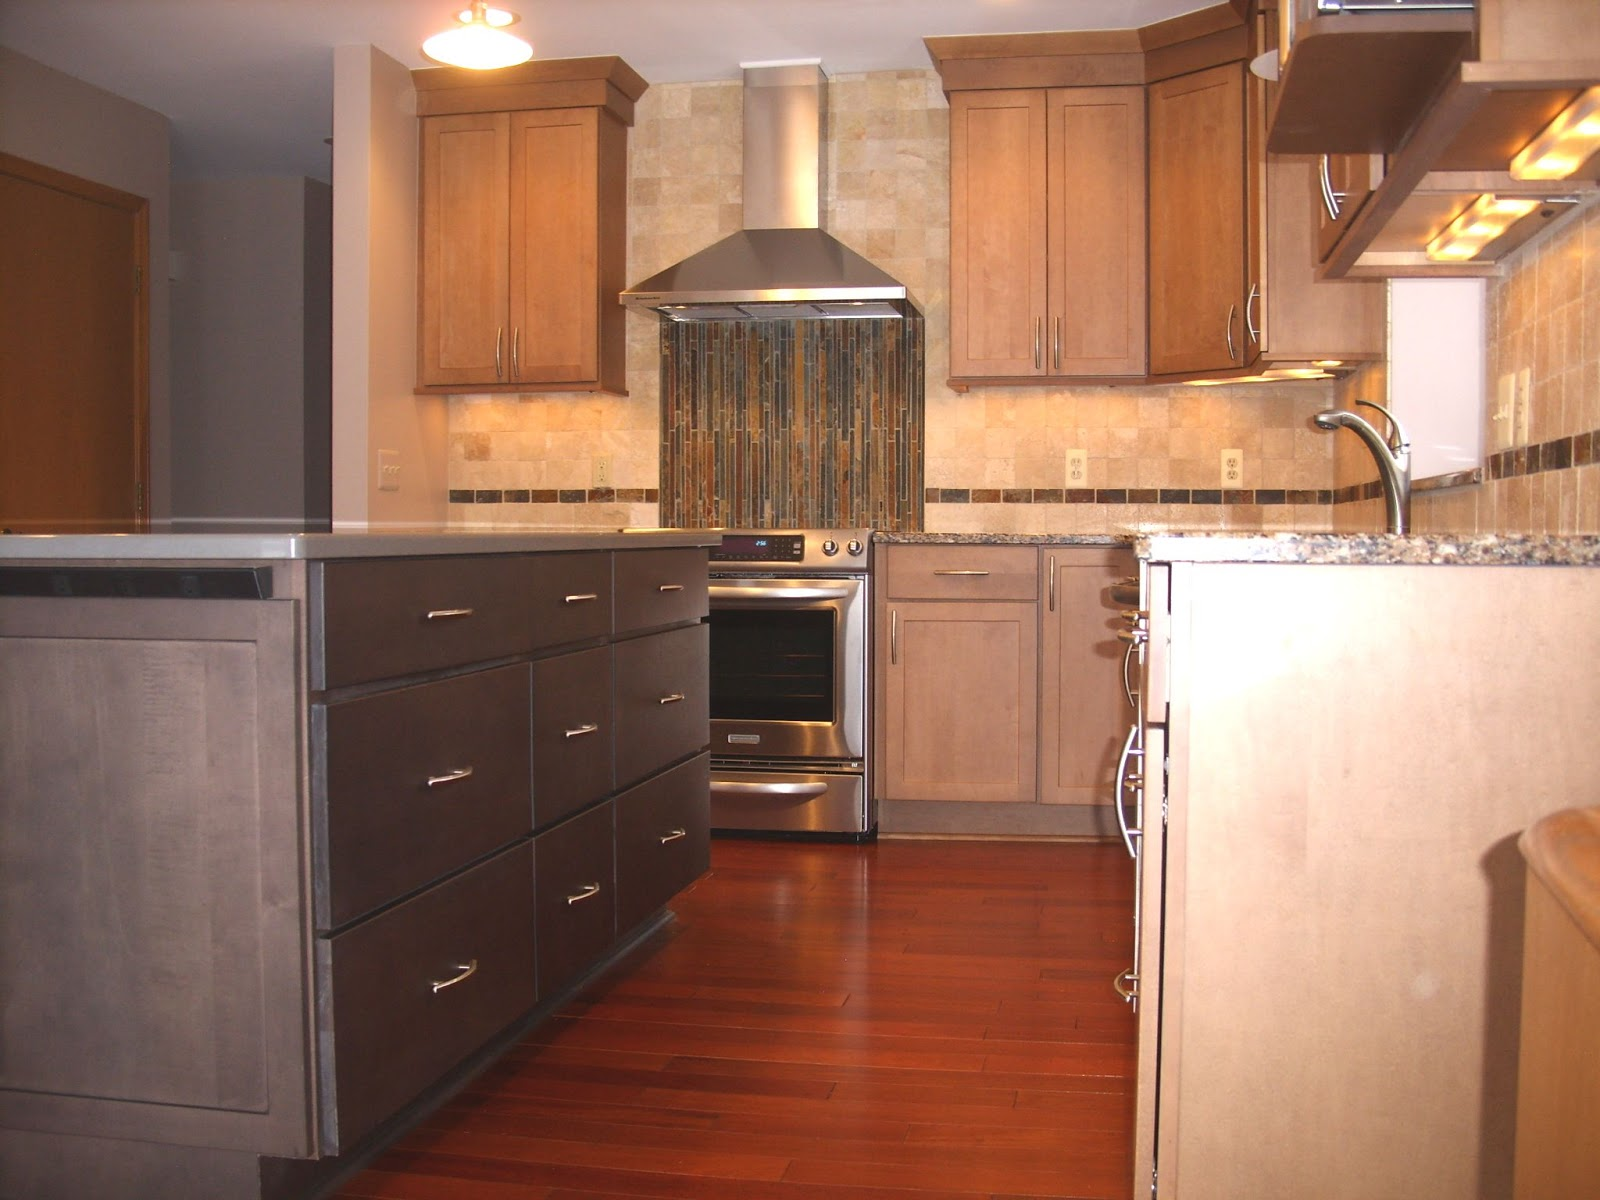 plywood kitchen cabinets backsplash design ideas borchert building blog difference between particle board